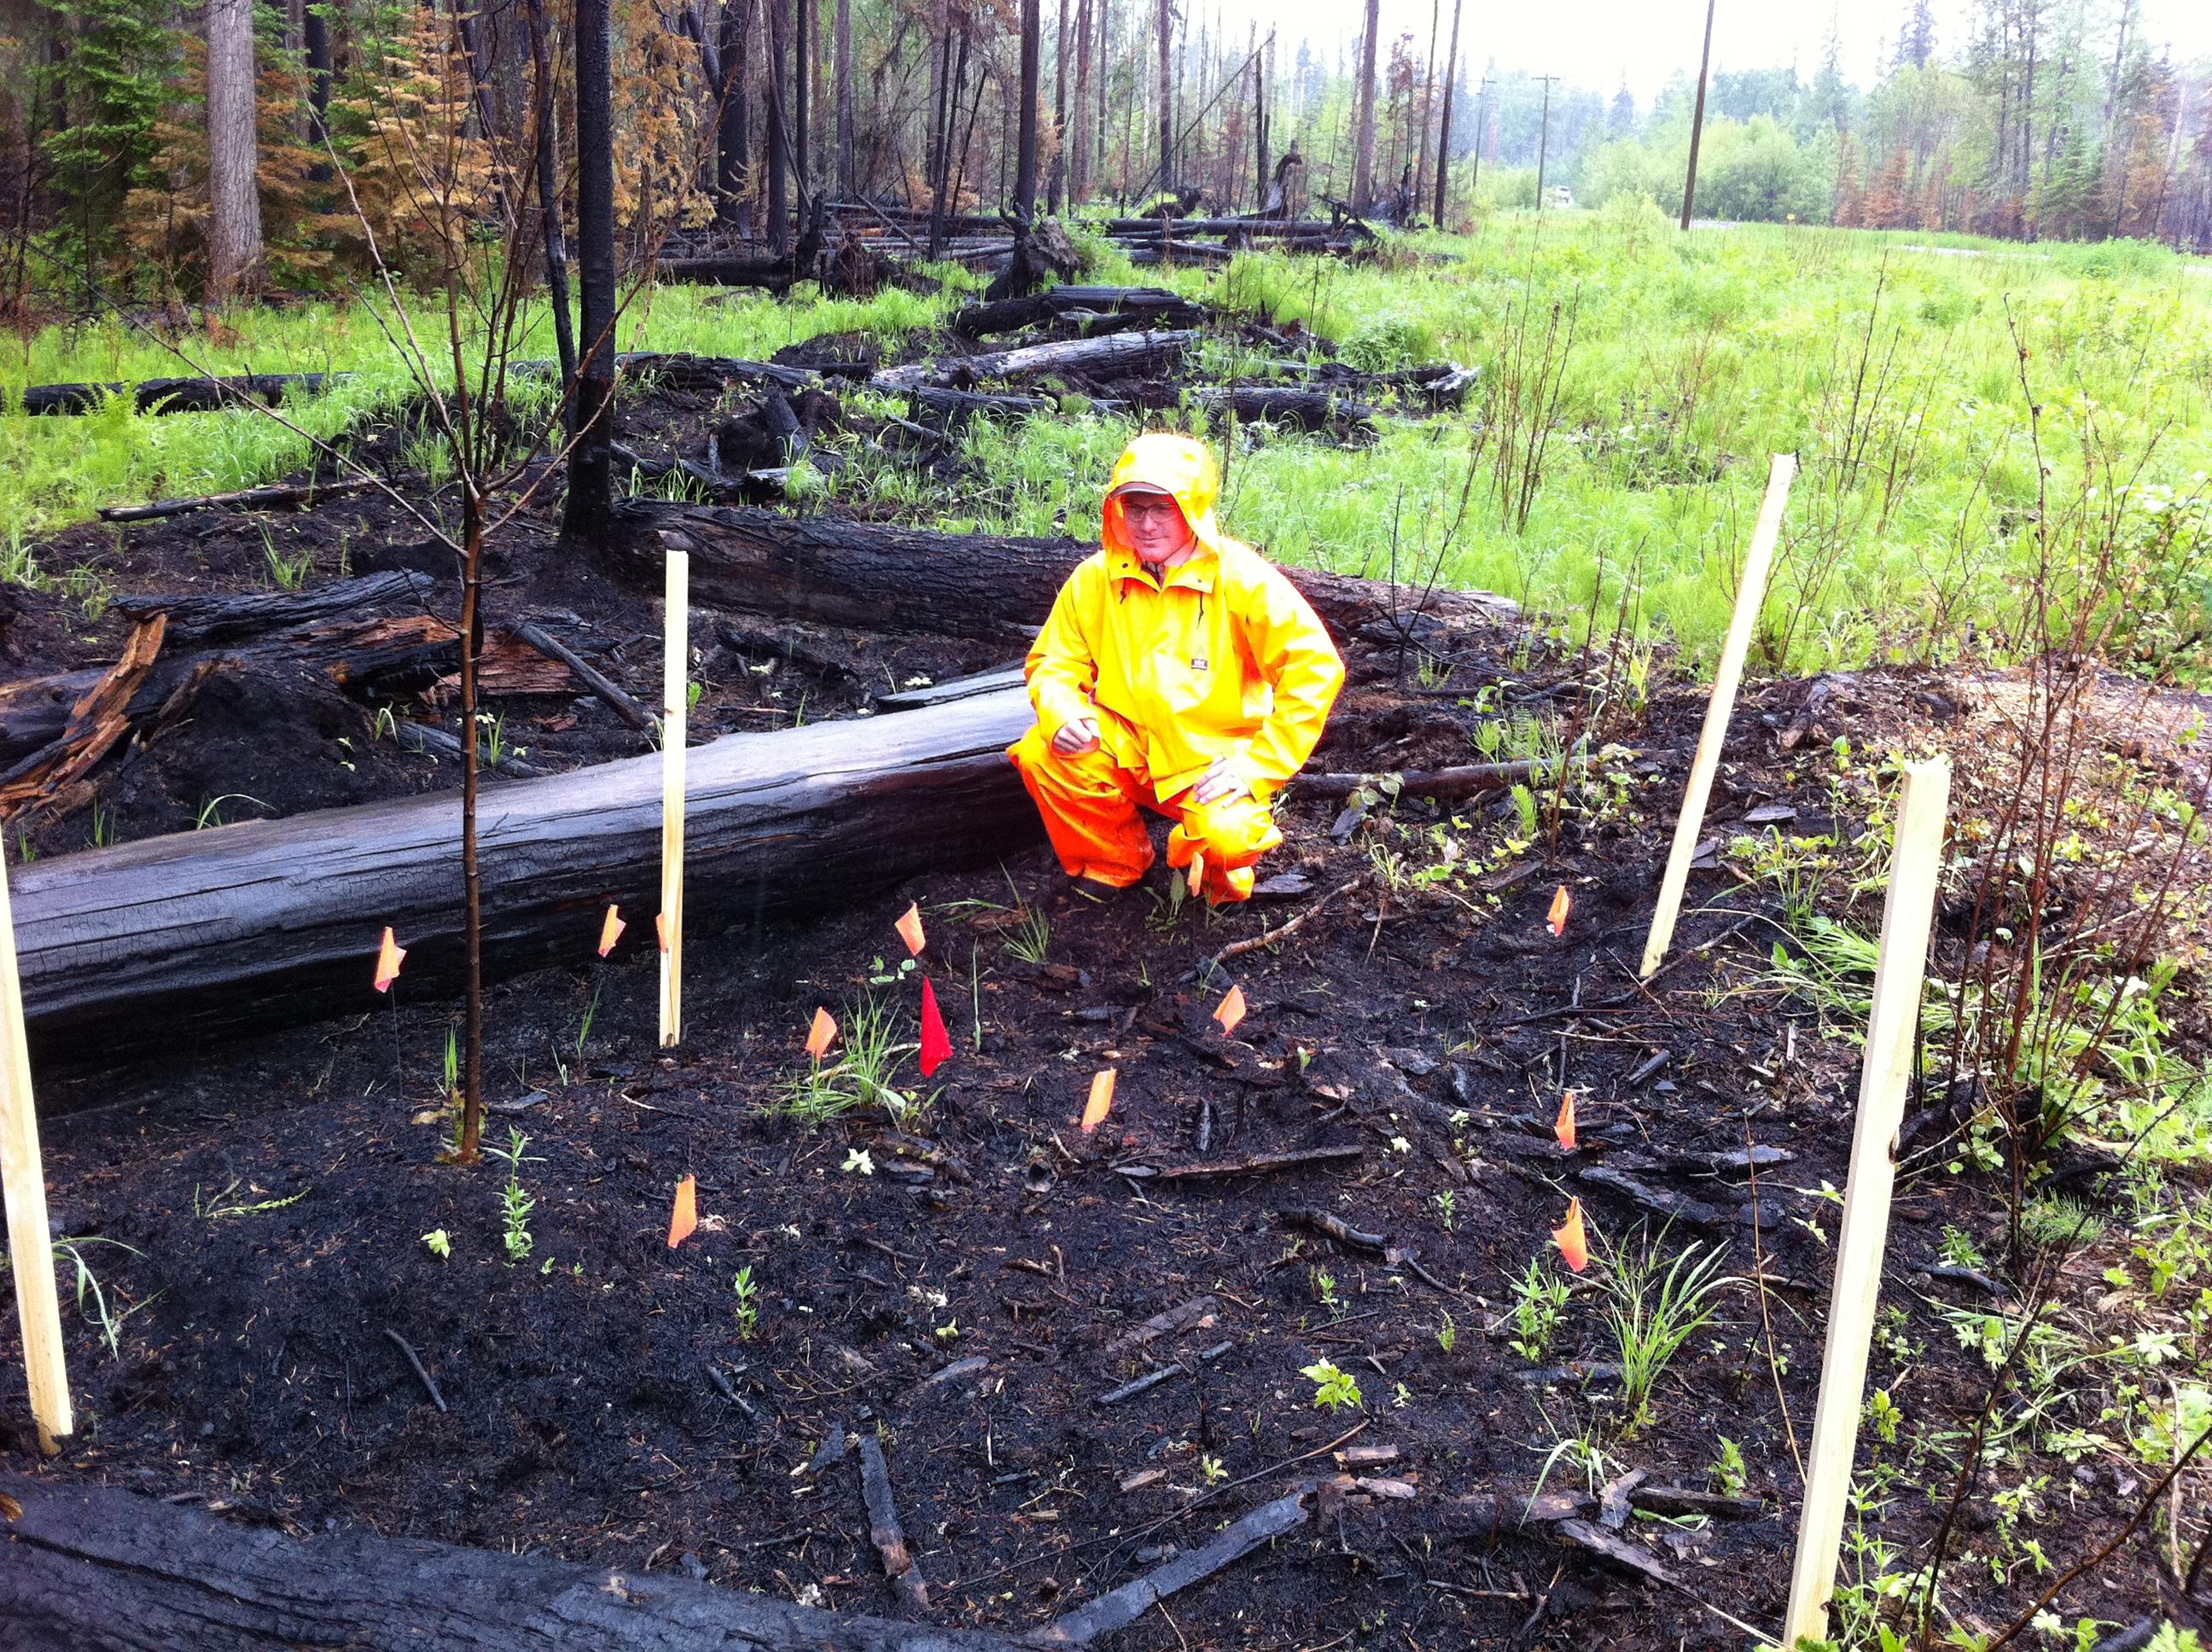 Burned area of arson wildfire investigation